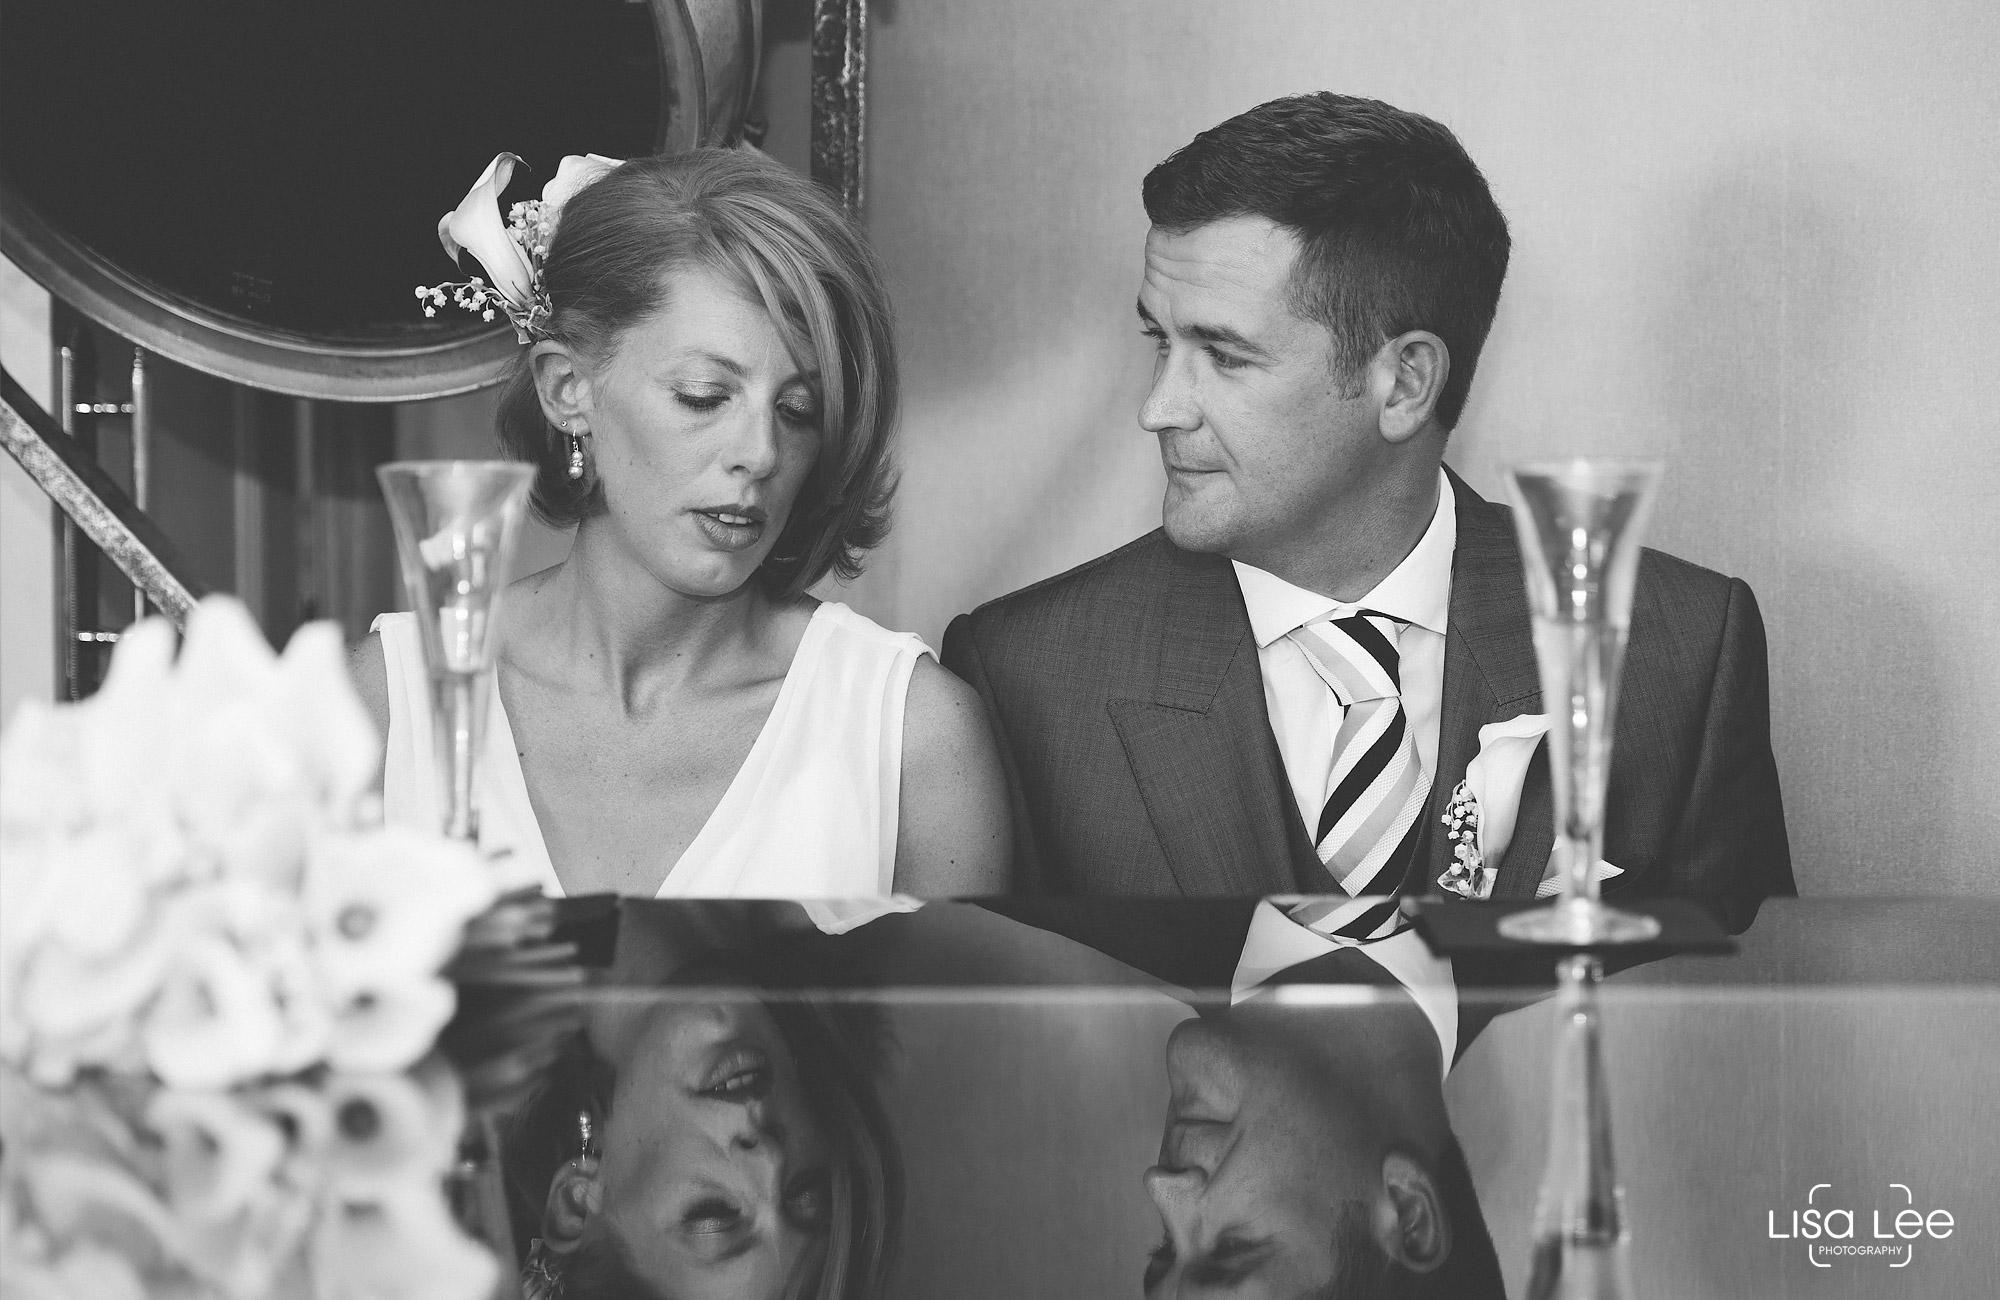 lisa-lee-wedding-photography-christchurch-dorset-piano.jpg